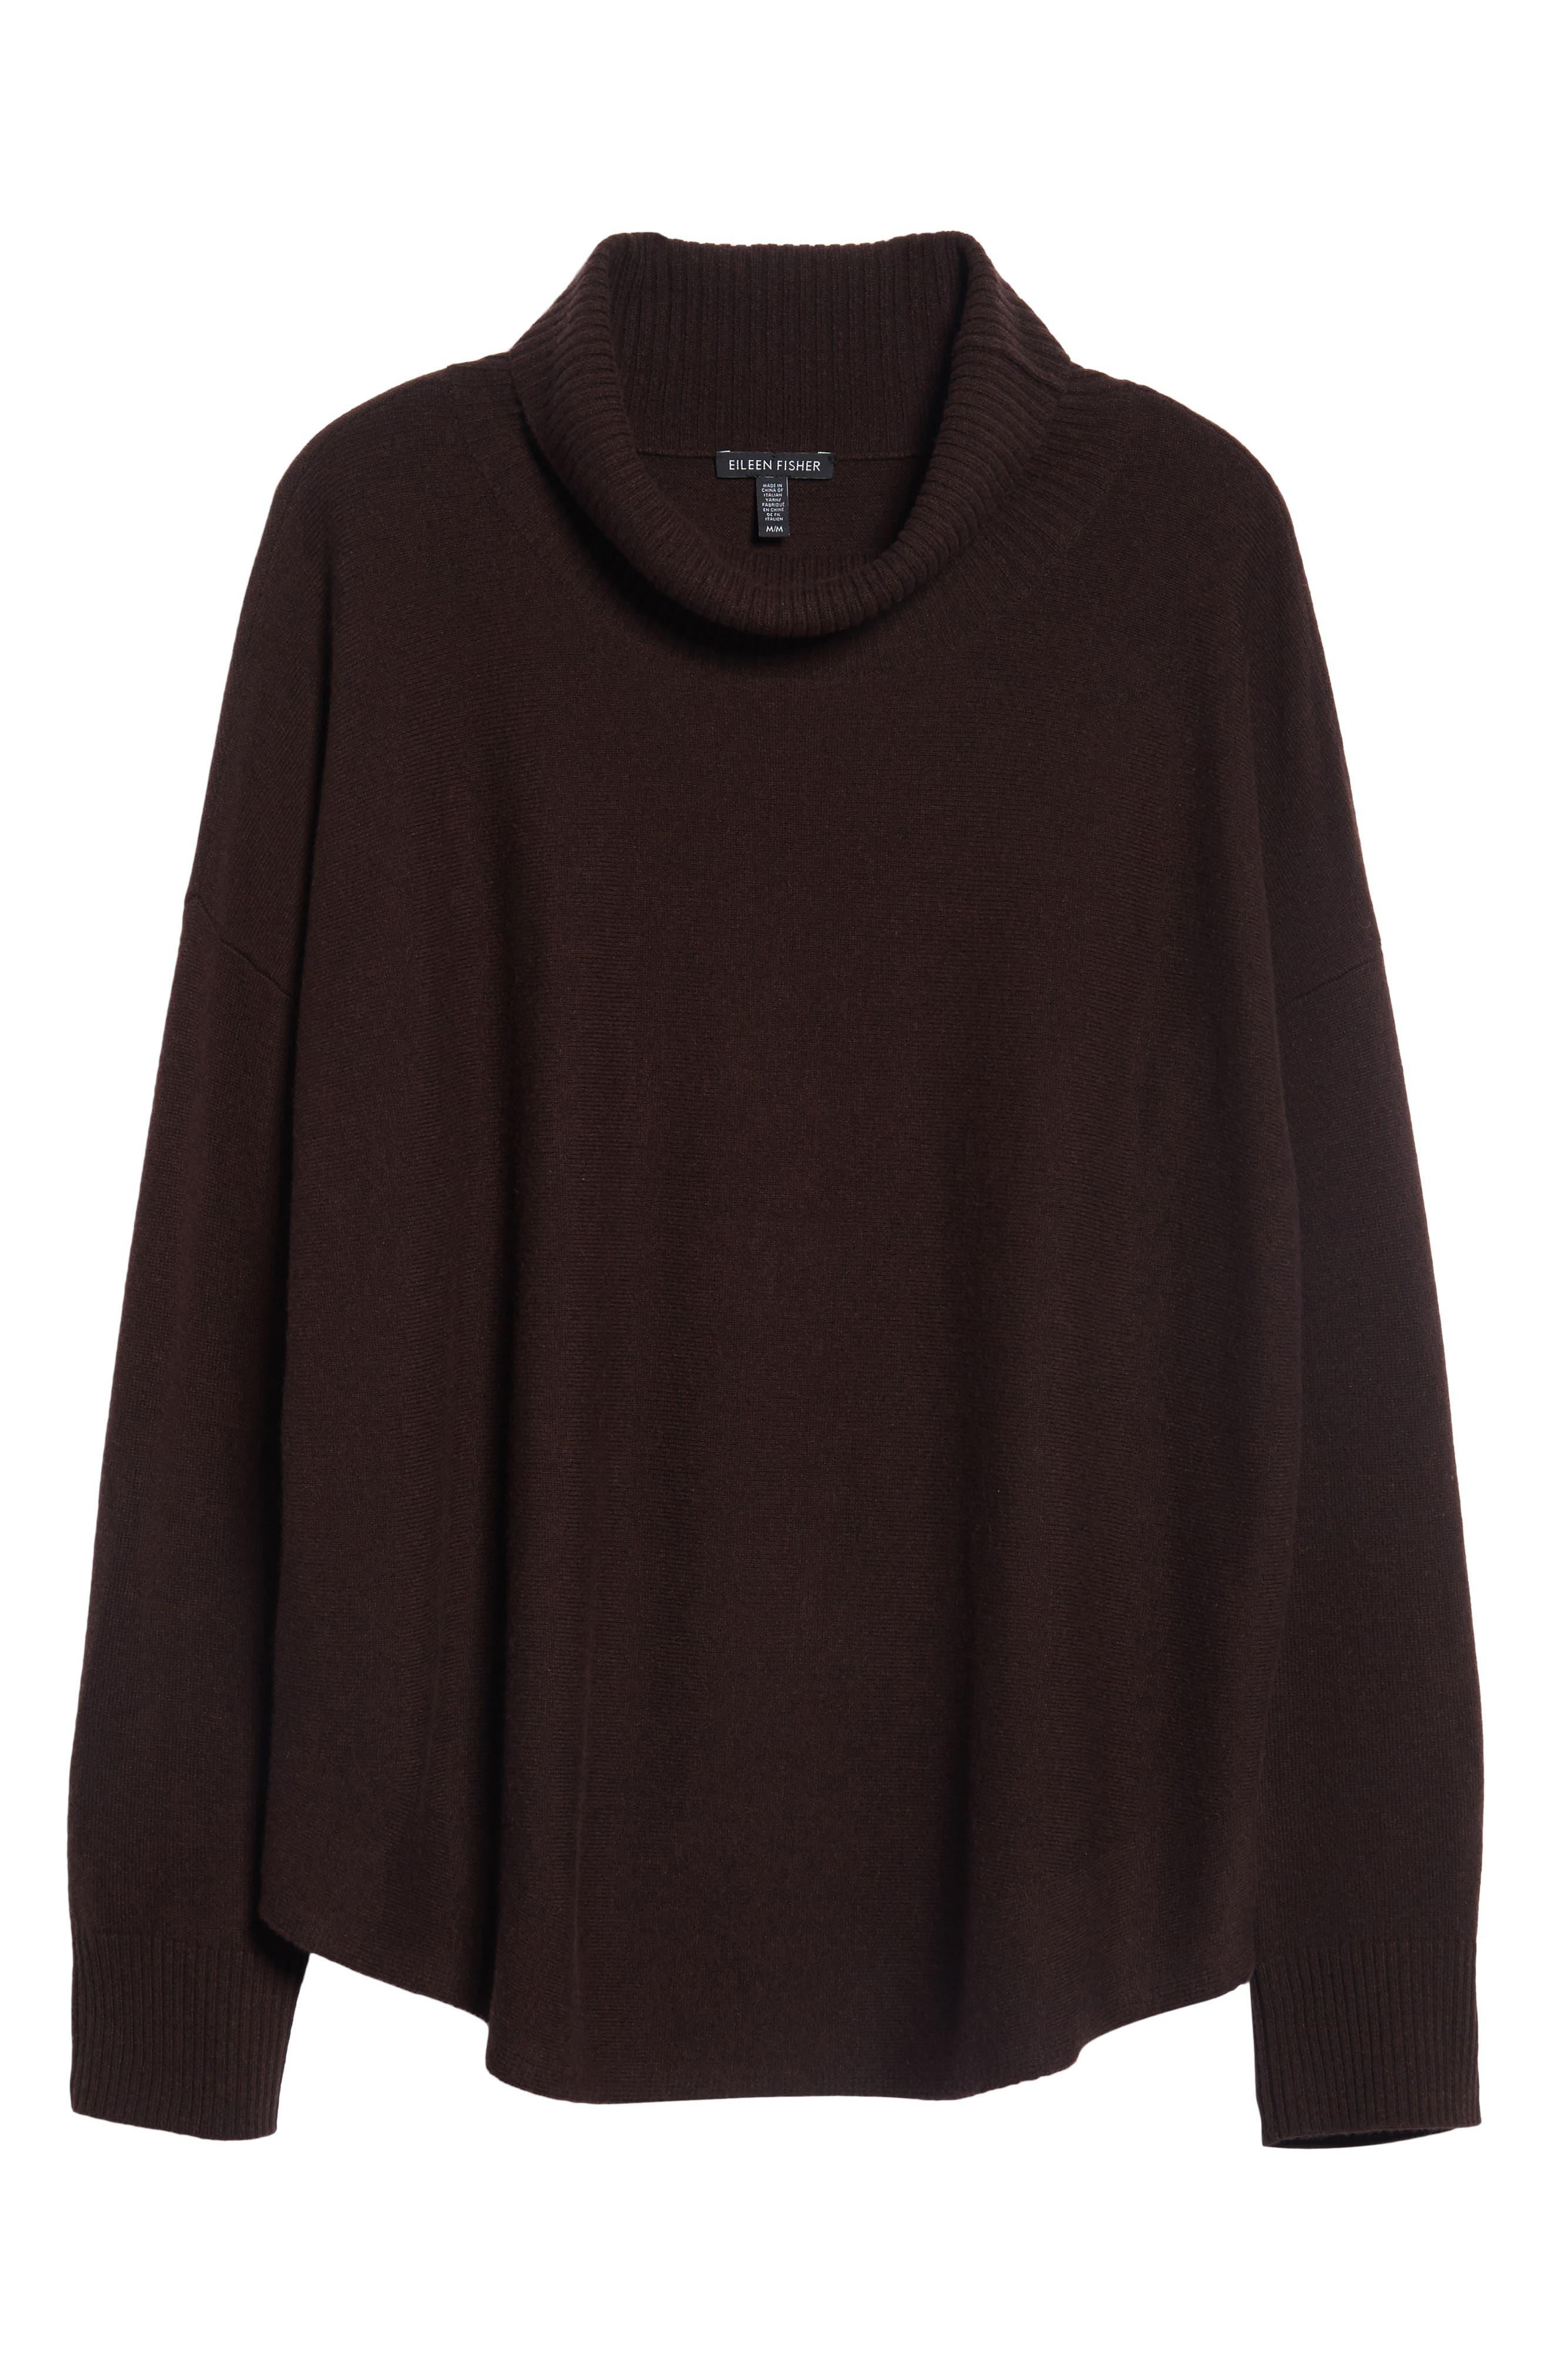 EileenFisher Draped TurtleneckSweater,                             Alternate thumbnail 6, color,                             211